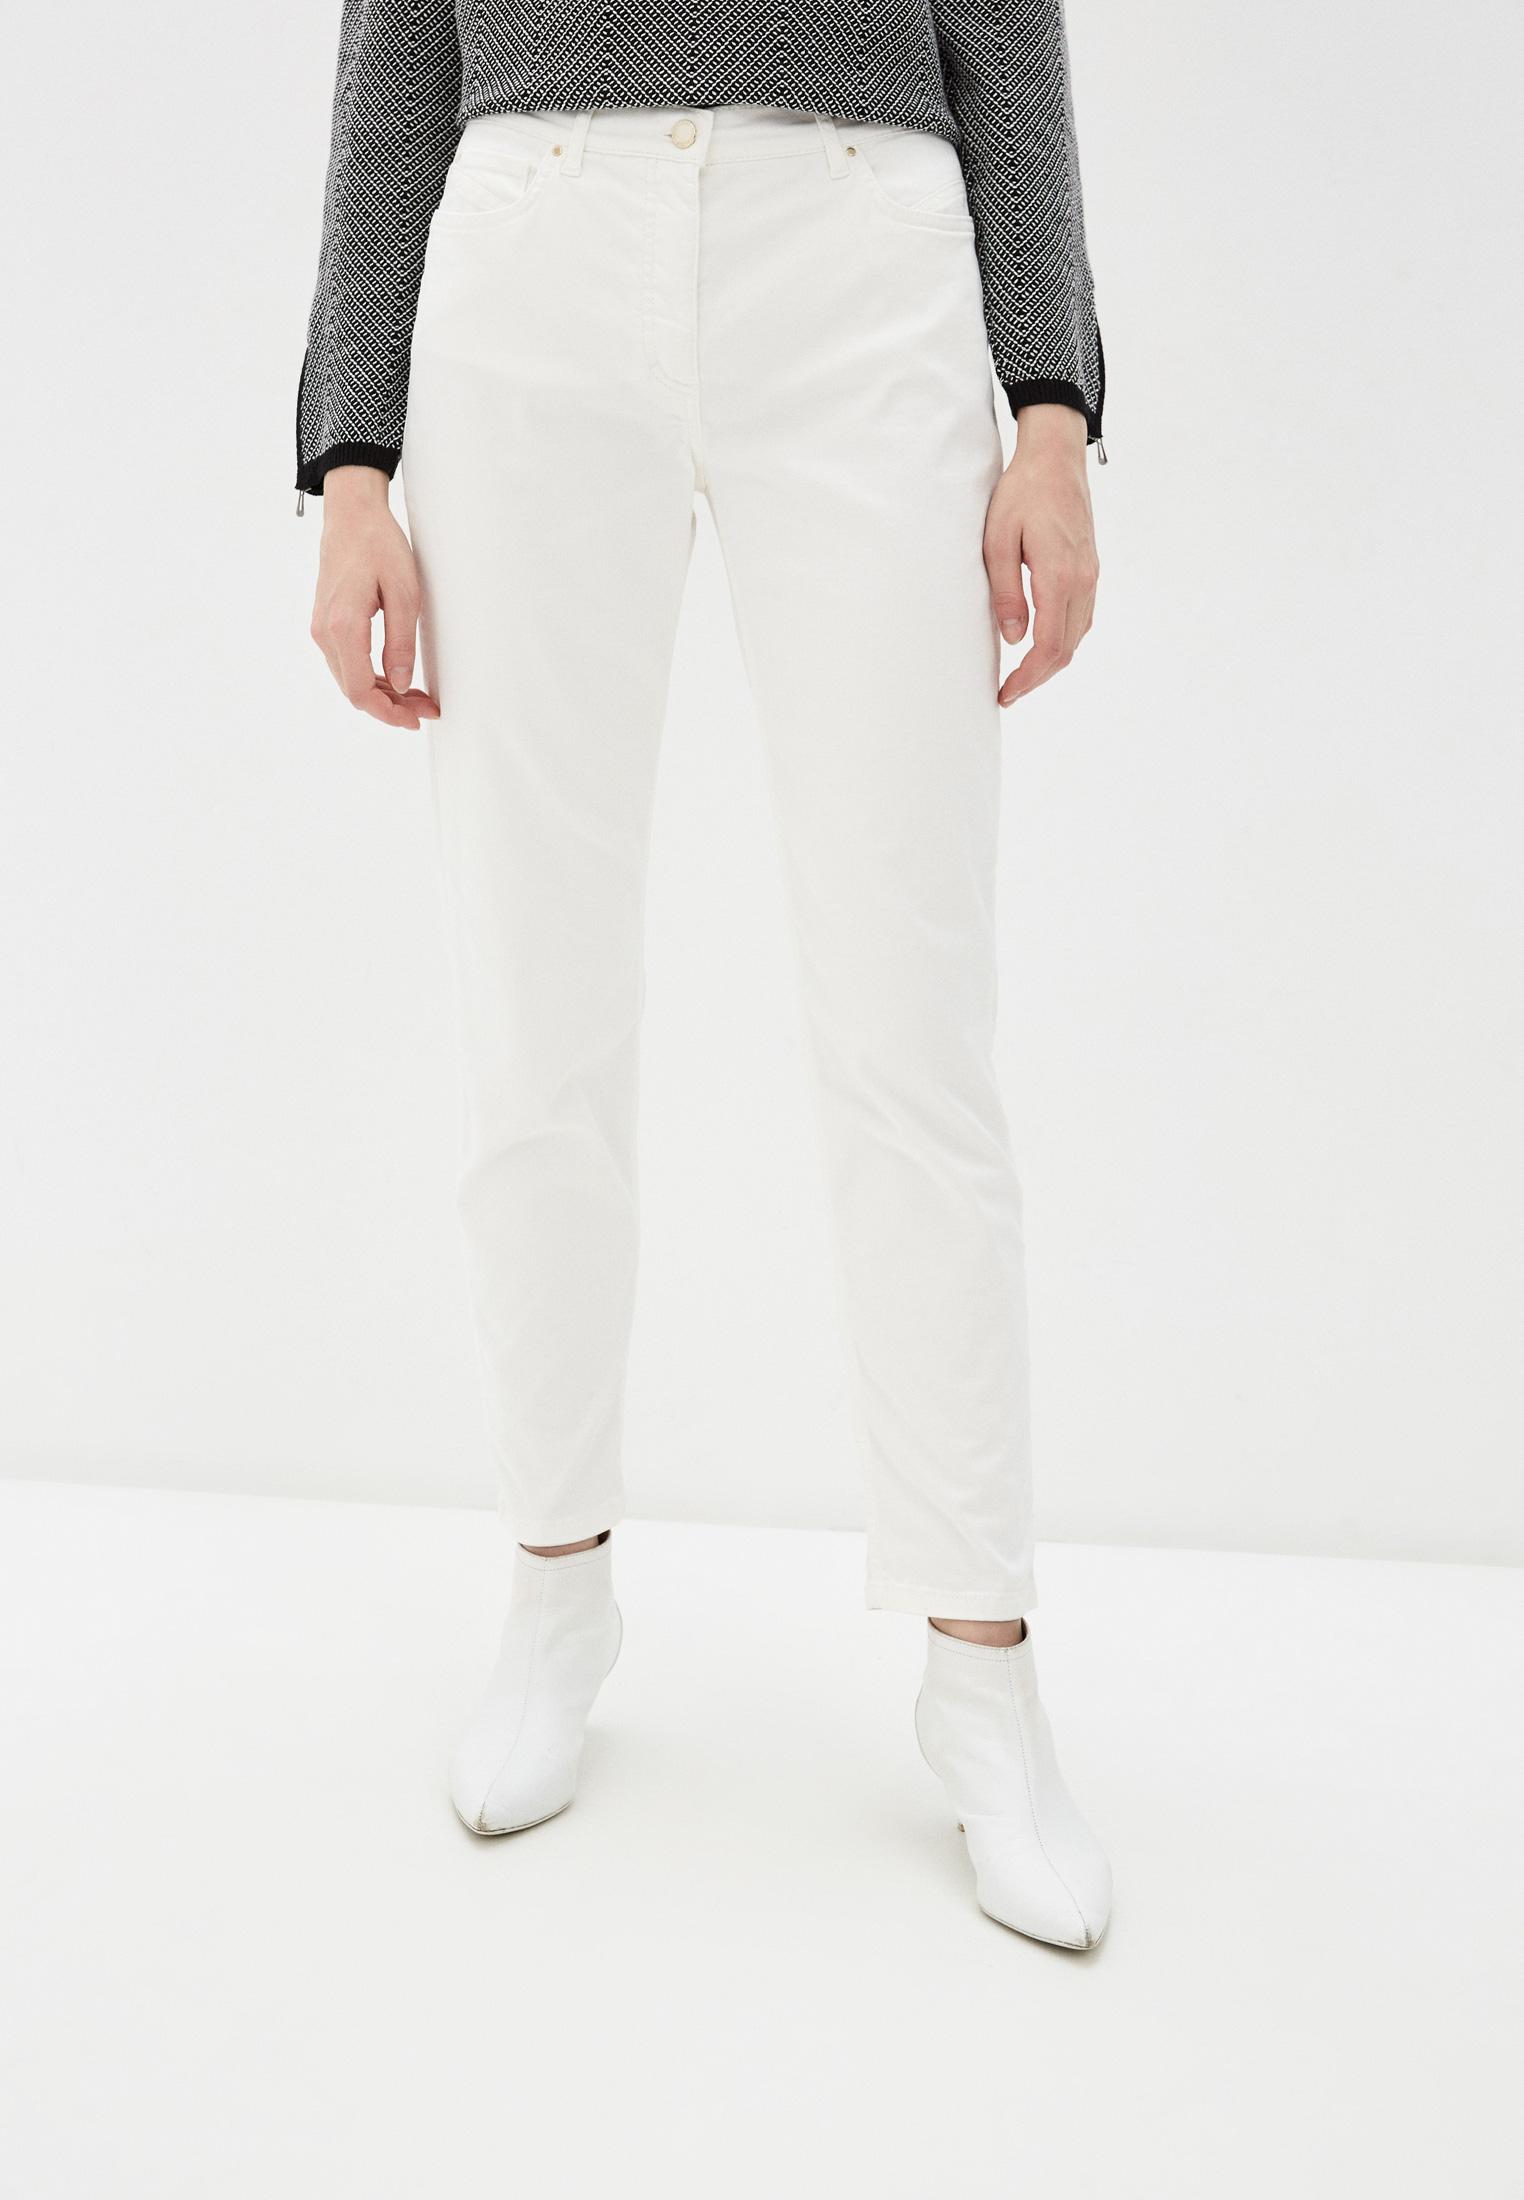 Женские джинсы Betty Barclay 6041/1201